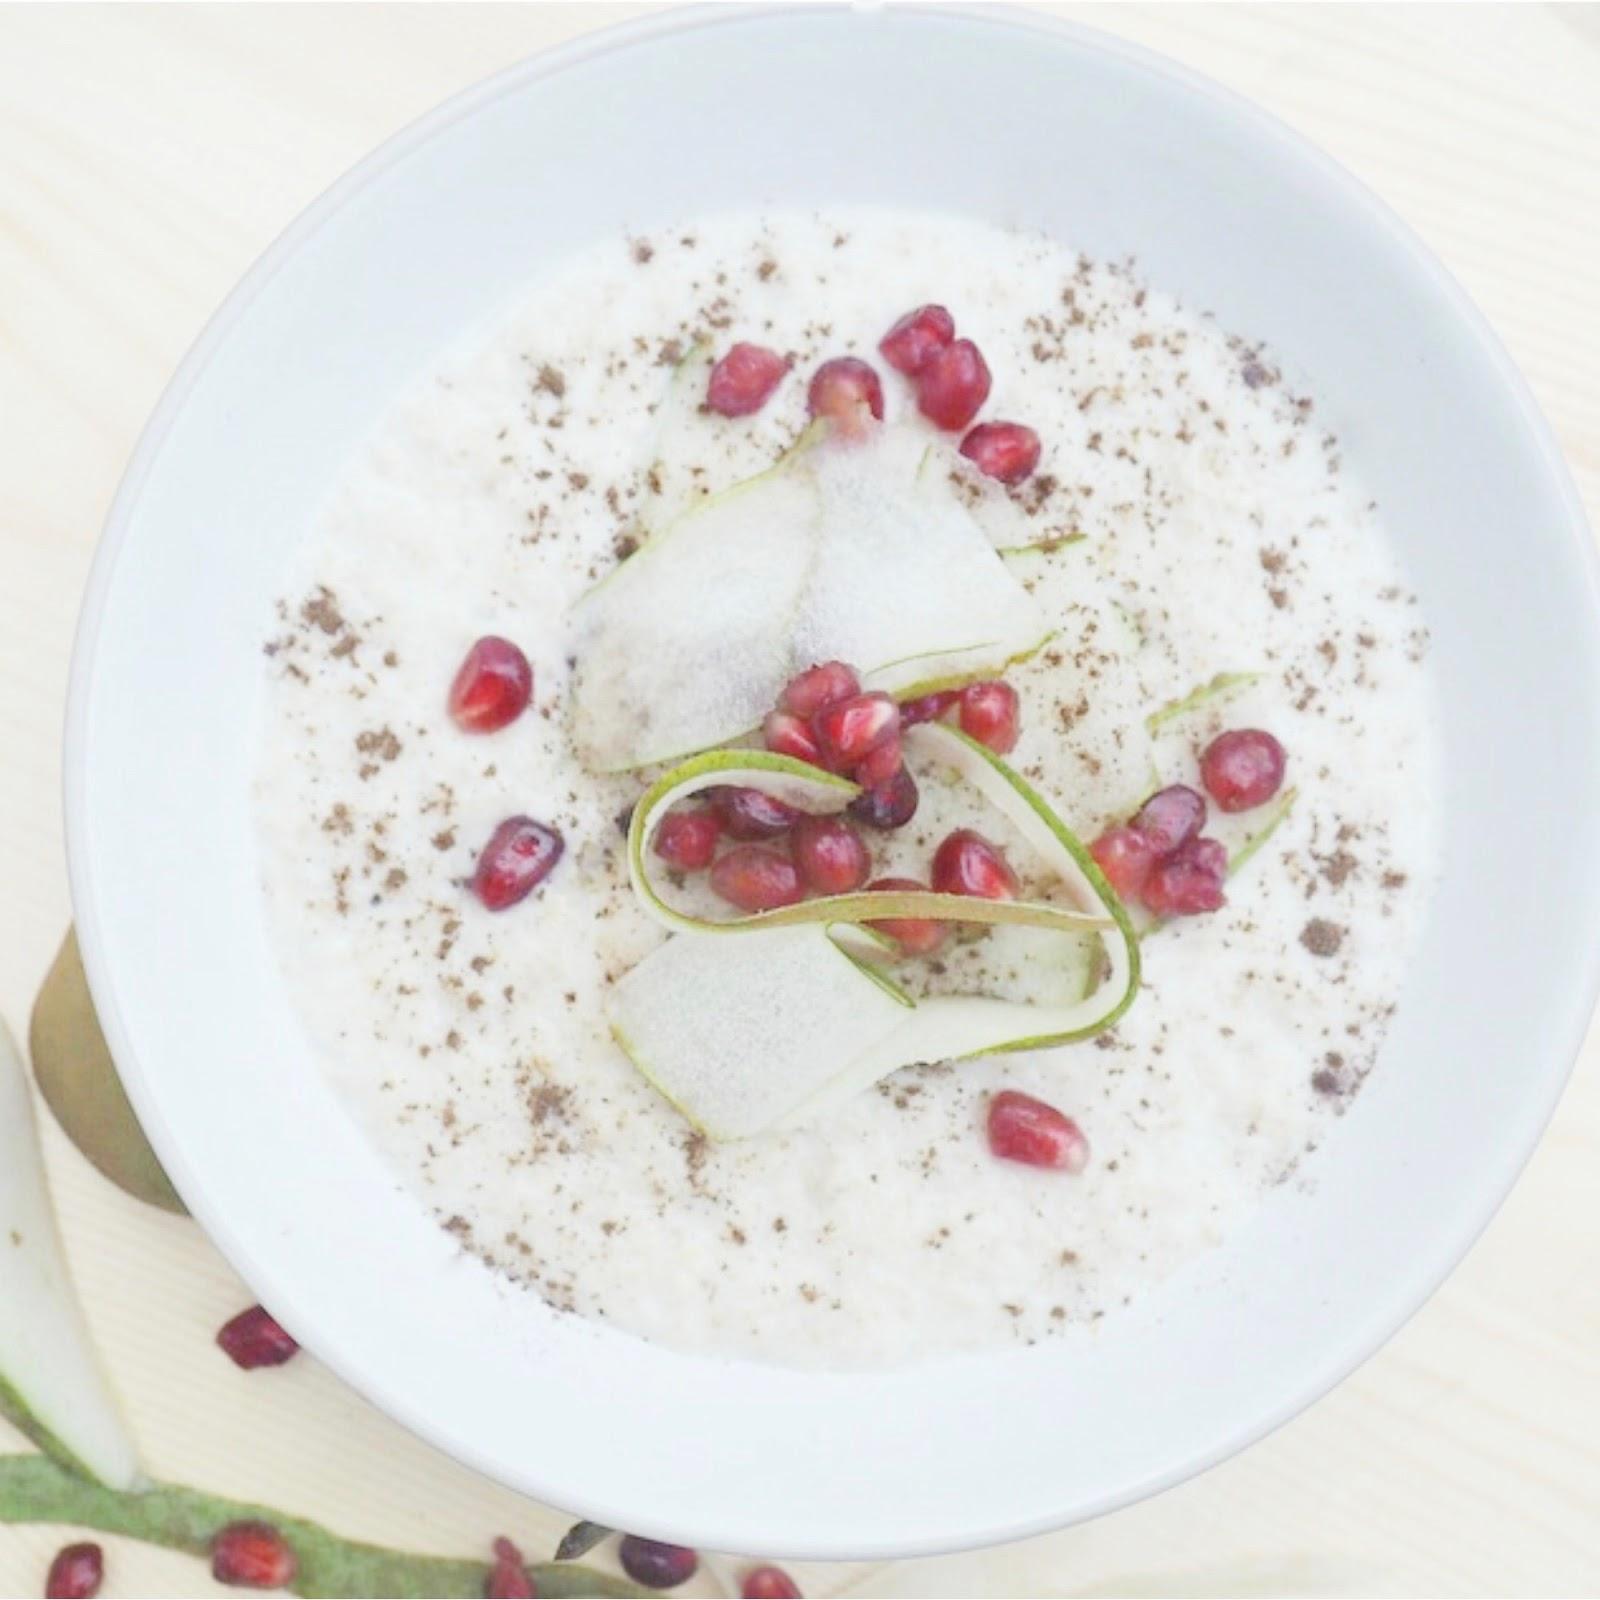 pomegranate and pear porridge